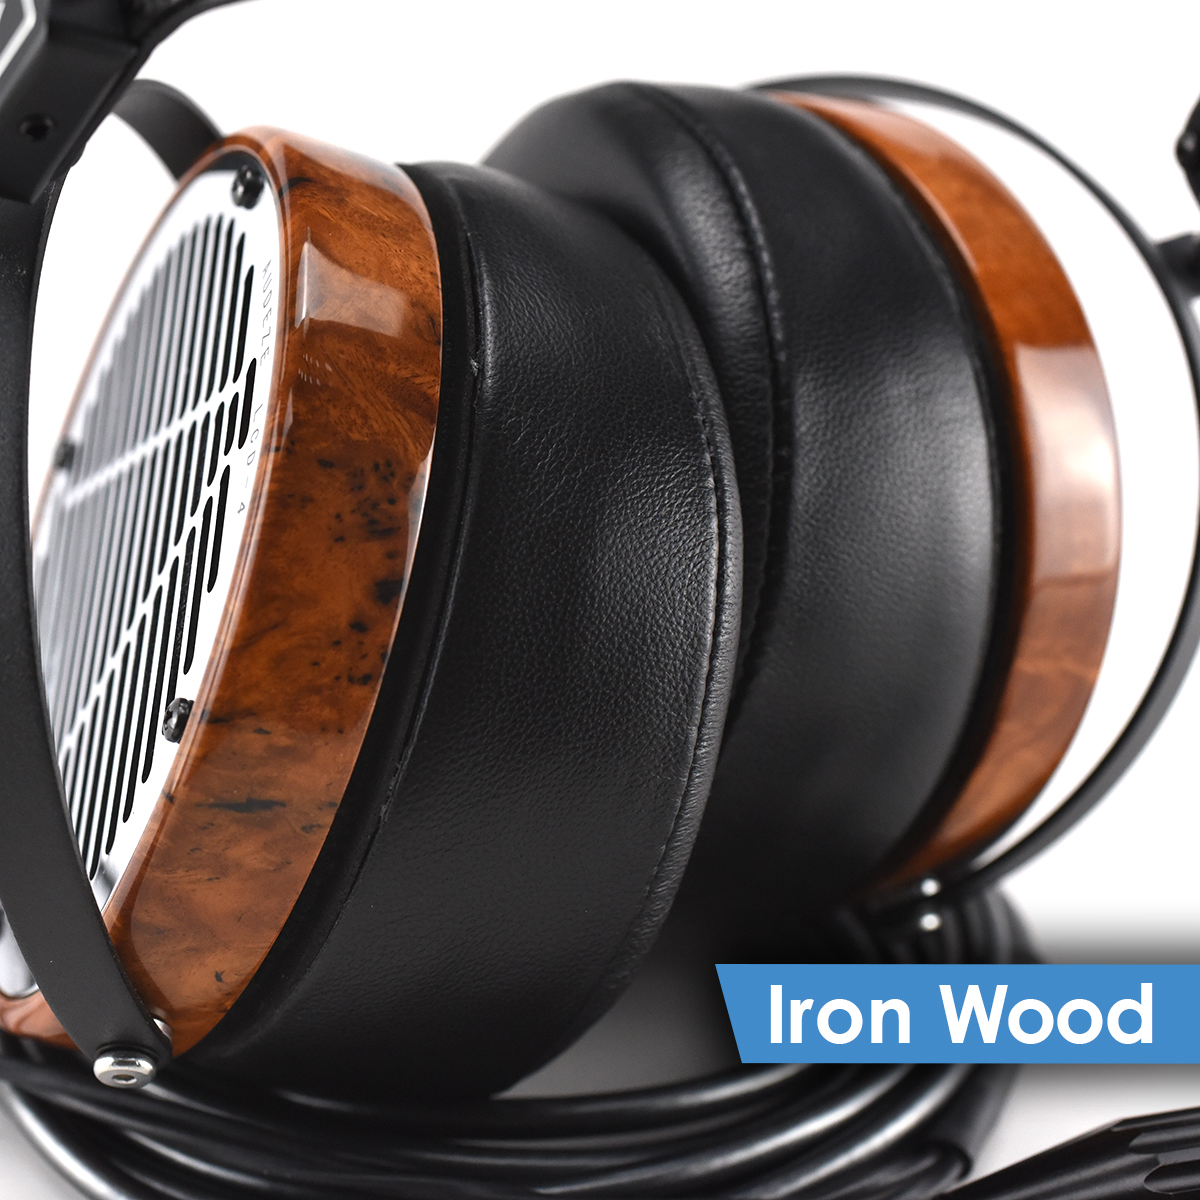 Audeze LCD-4 Iron Wood